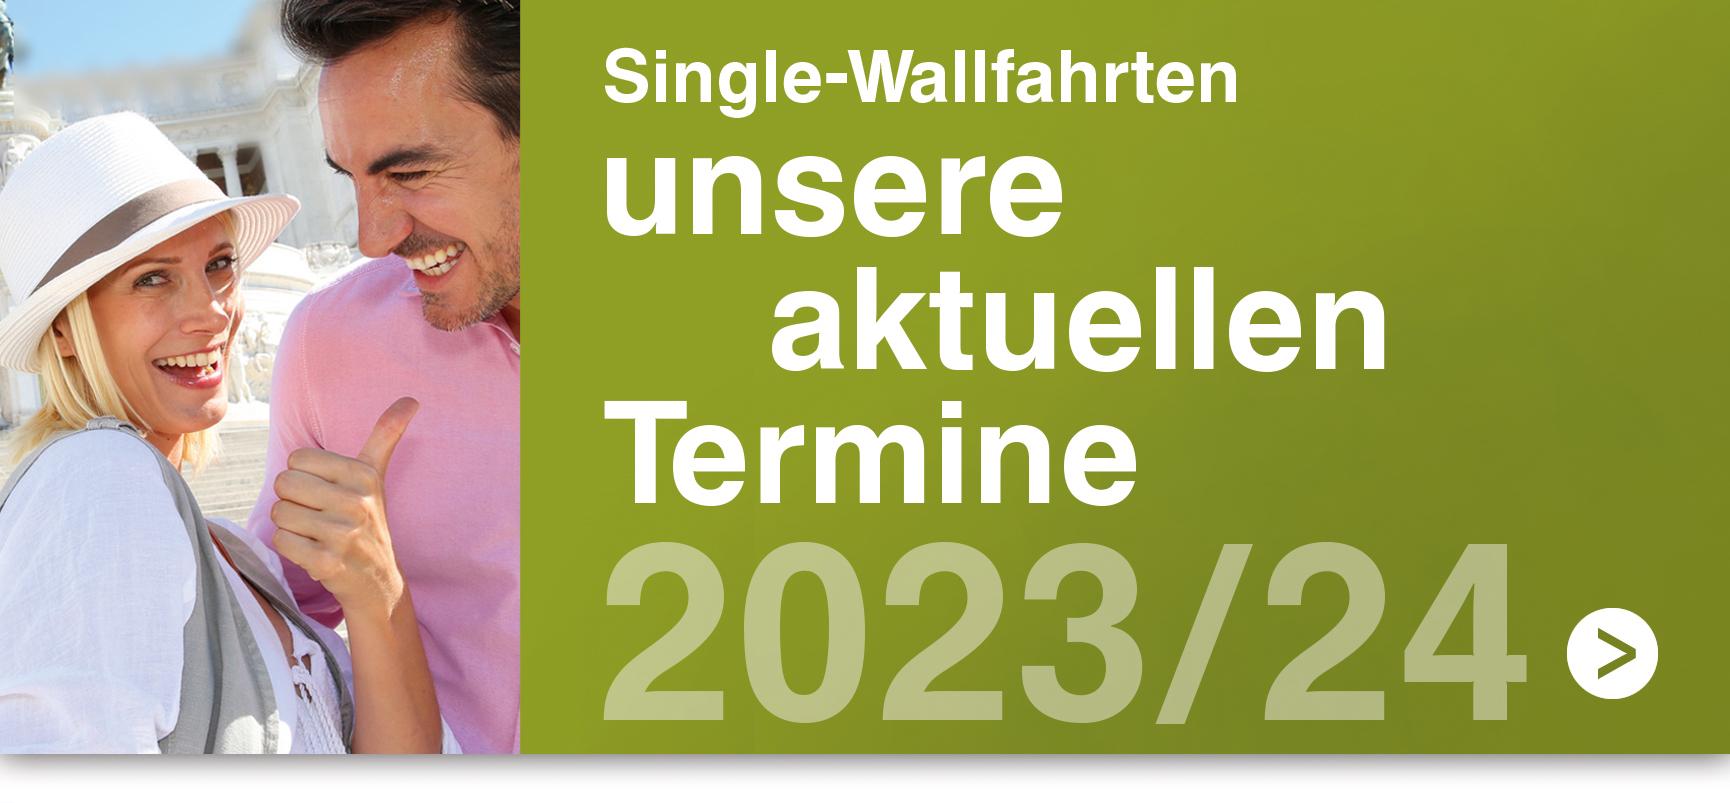 Kstendorf speeddating Dating kostenlos in hinterbrhl